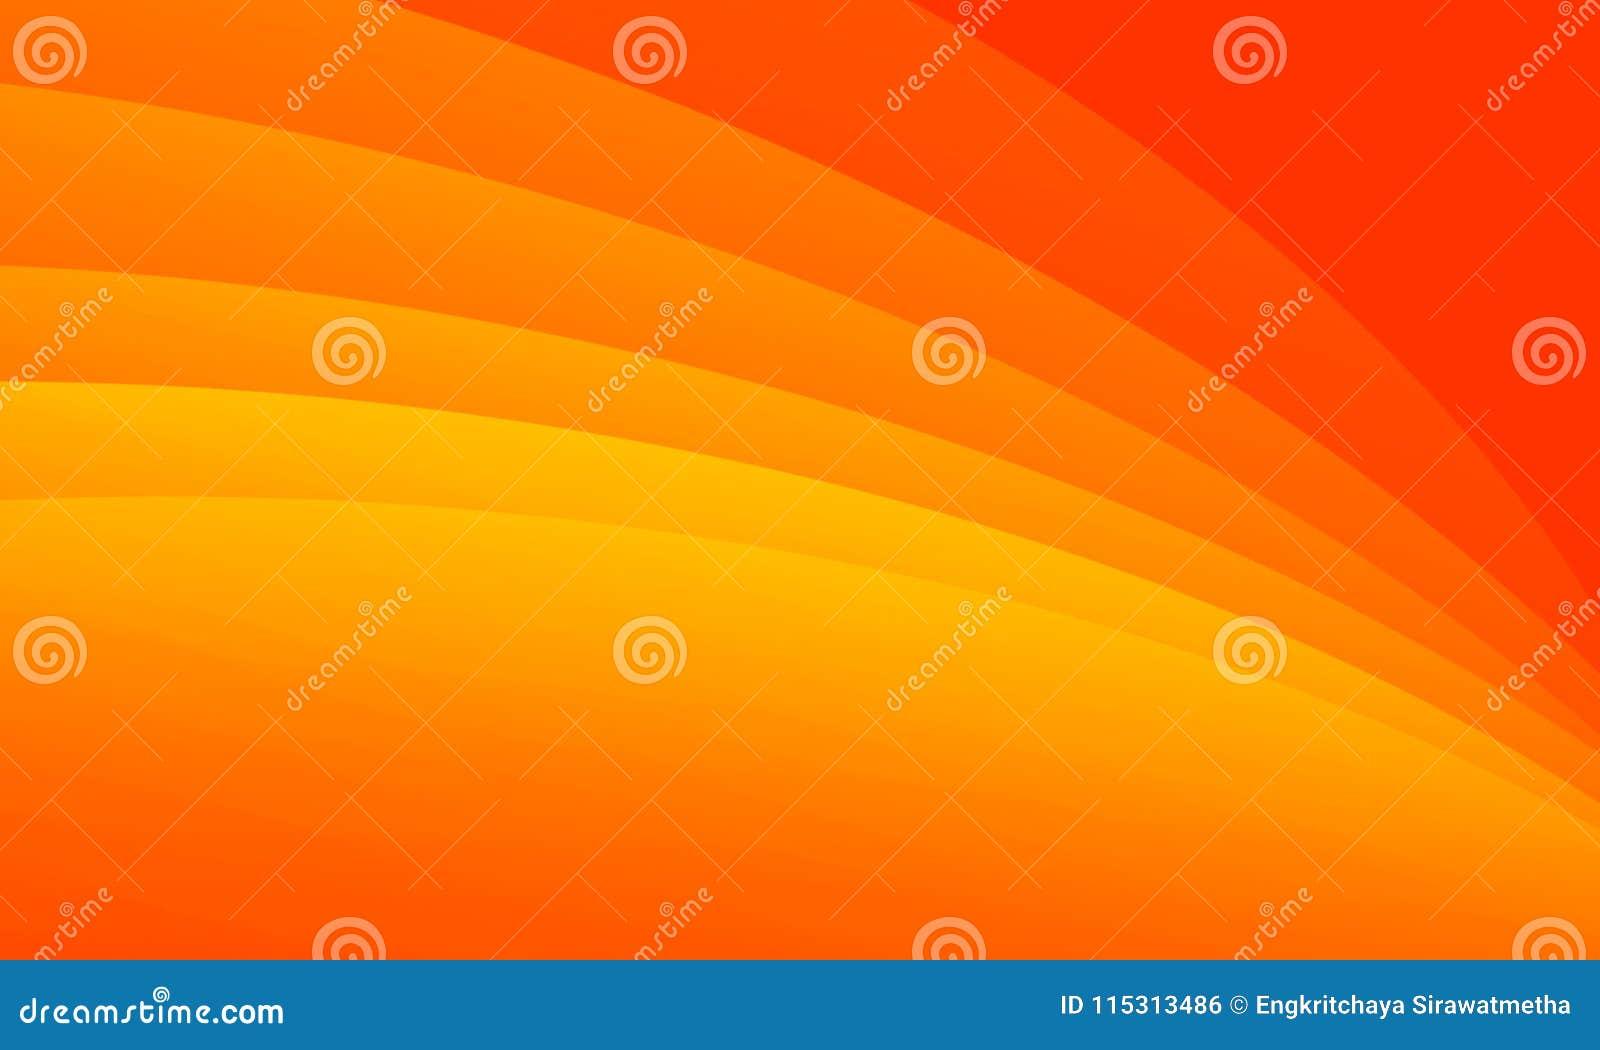 Download 70 Koleksi Background Orange Line Gratis Terbaik